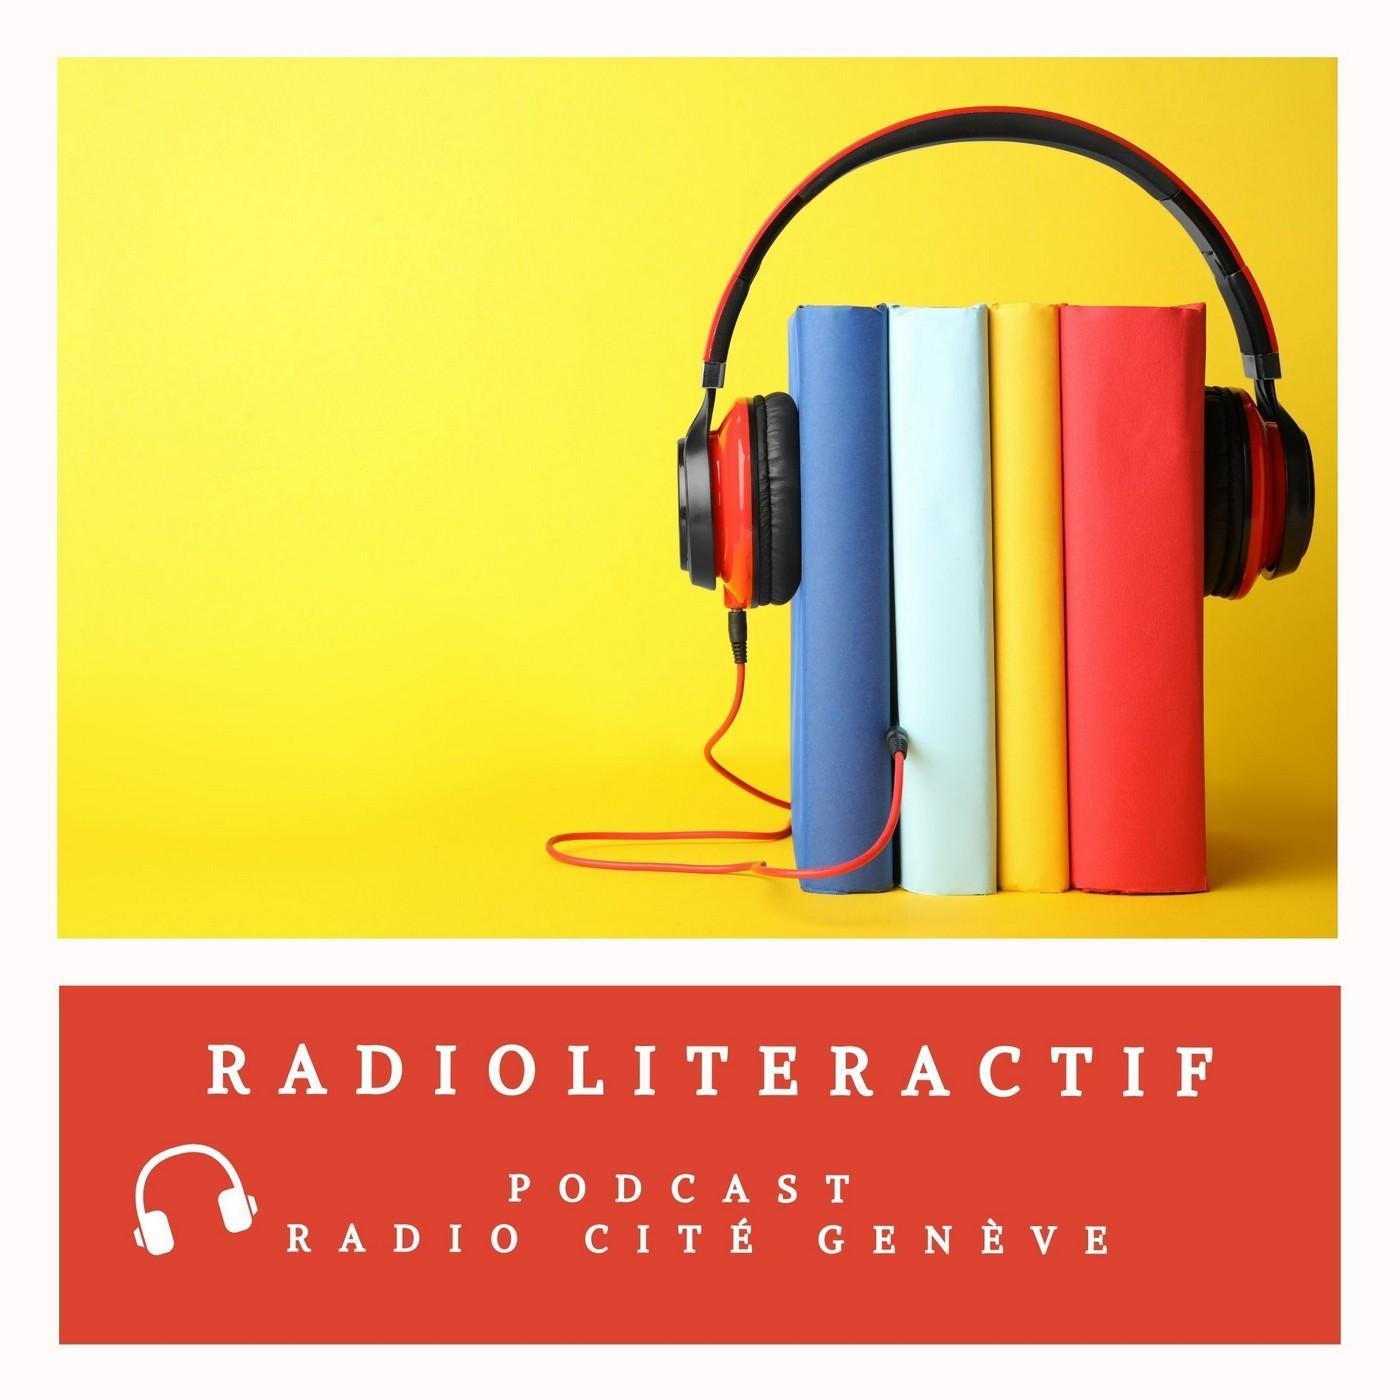 Radioliteractif du 12/07/2021 - Xavier Chillier